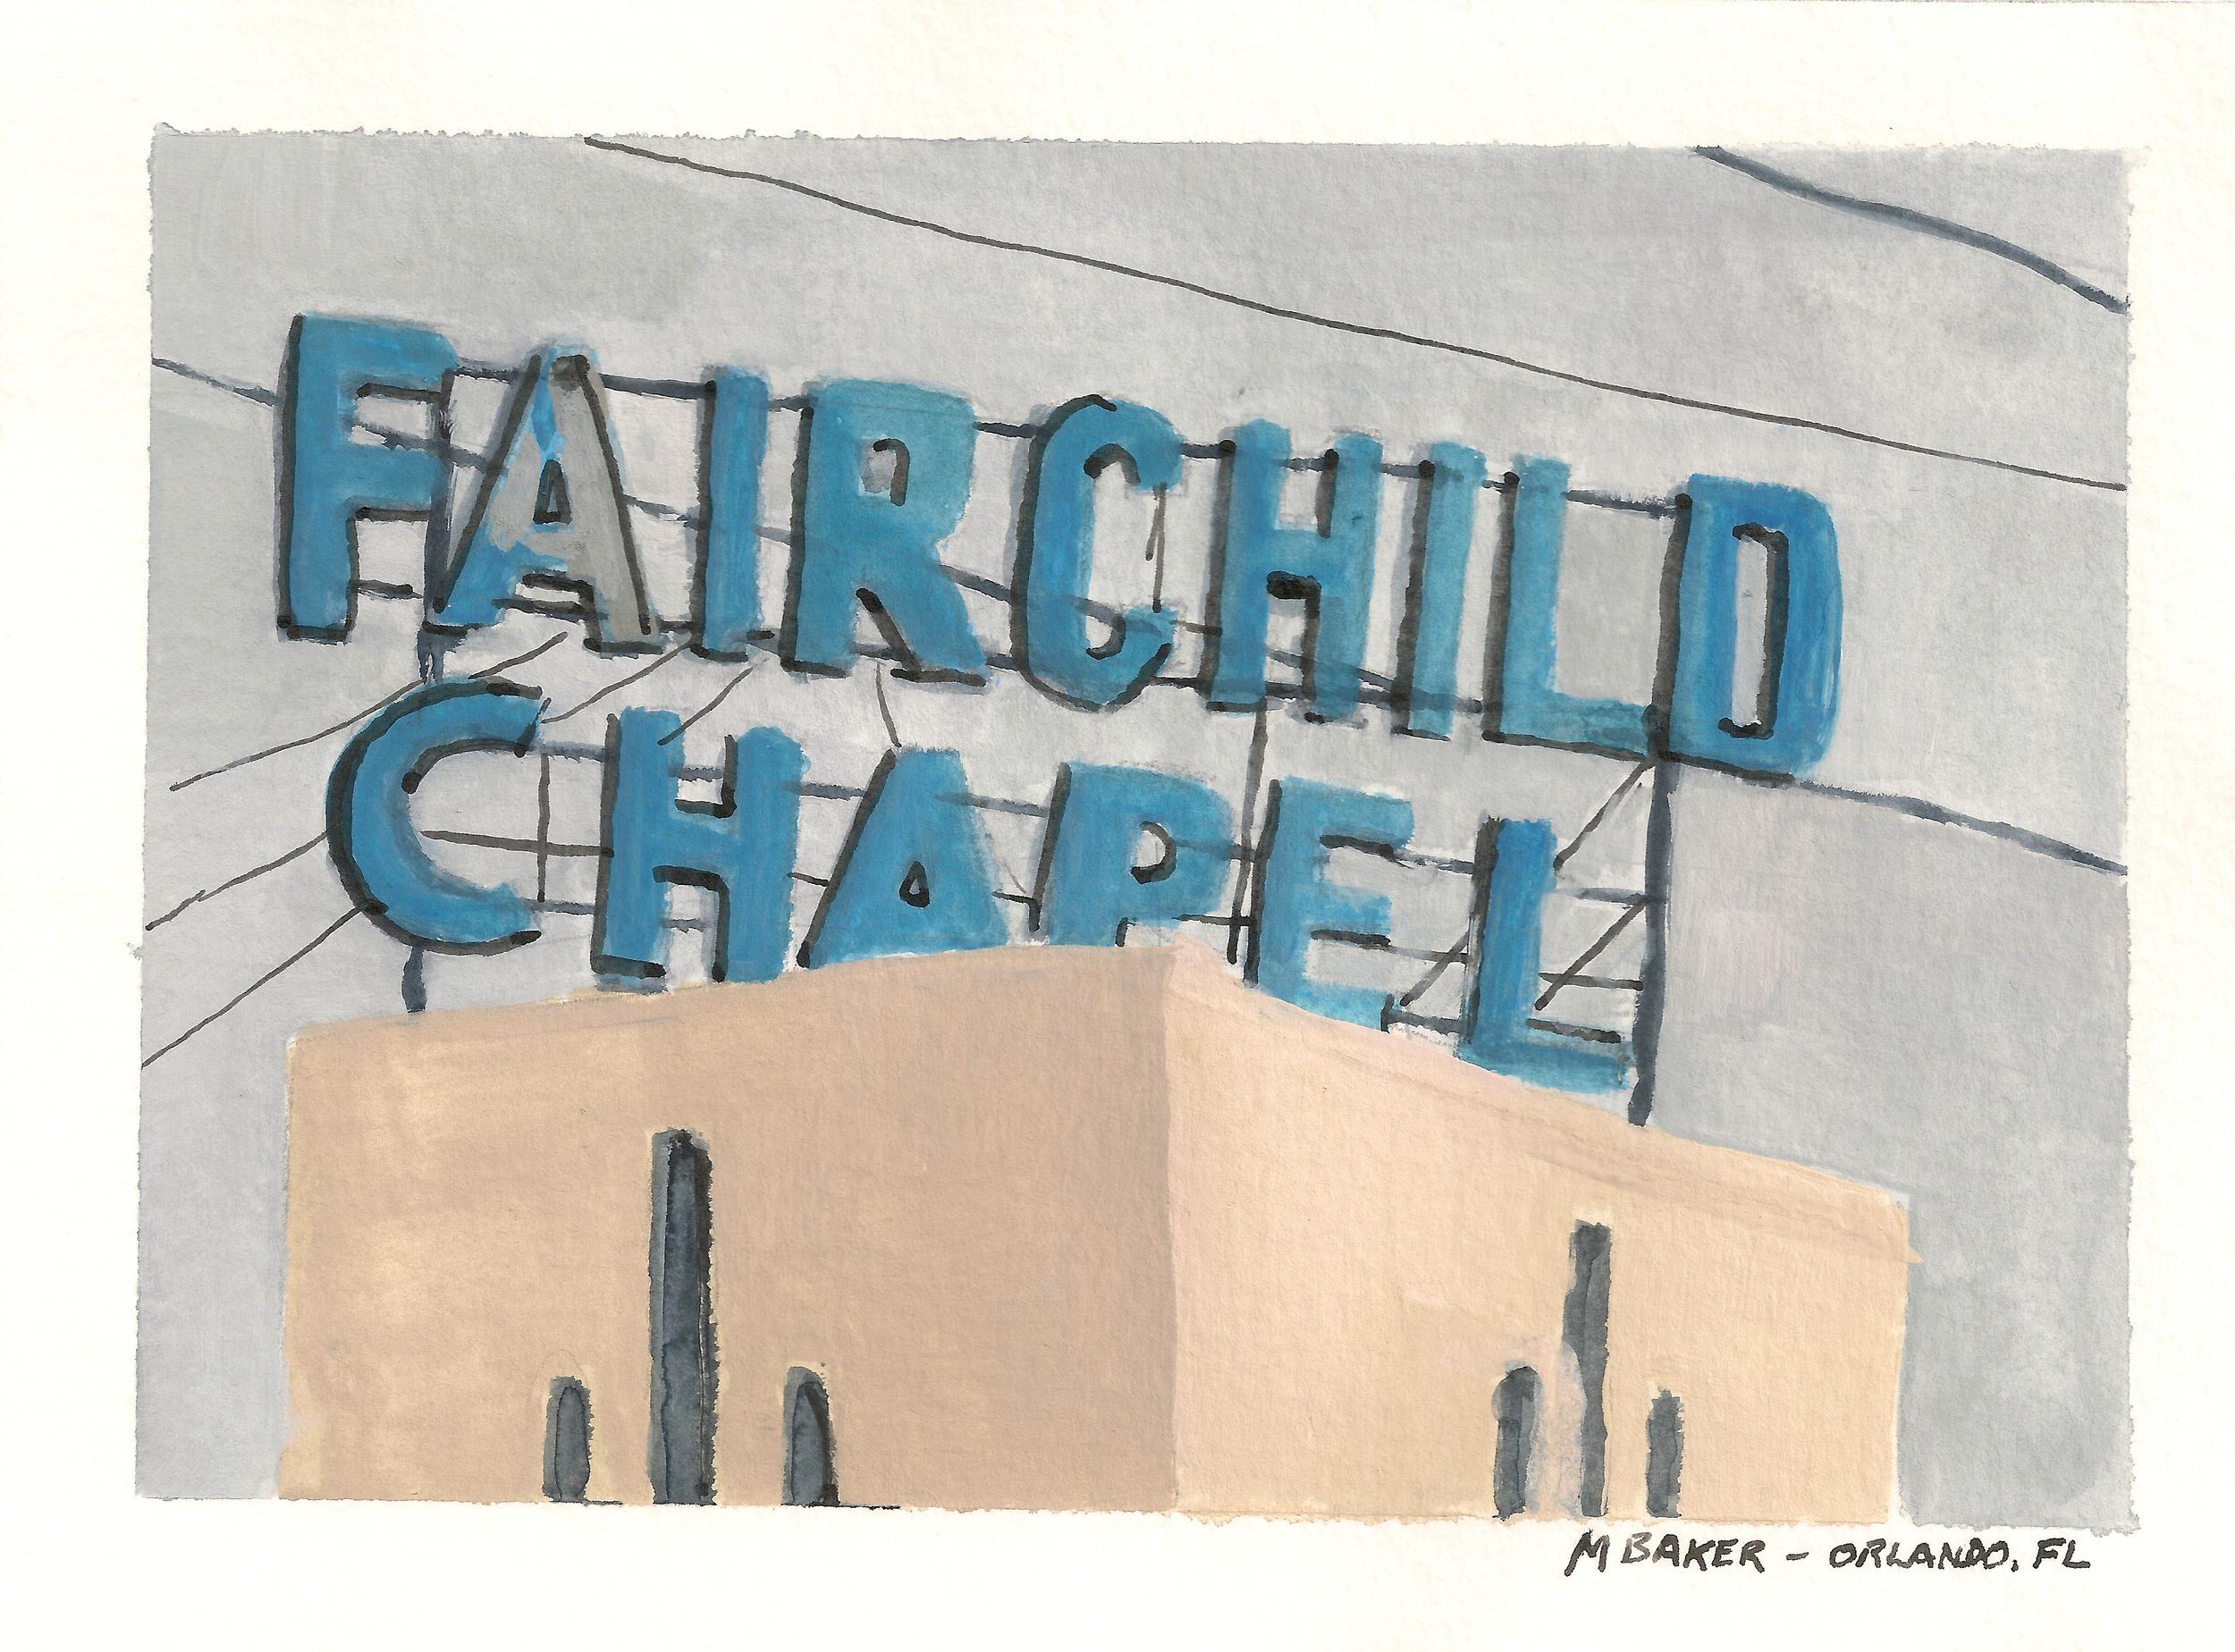 Fairchild.png